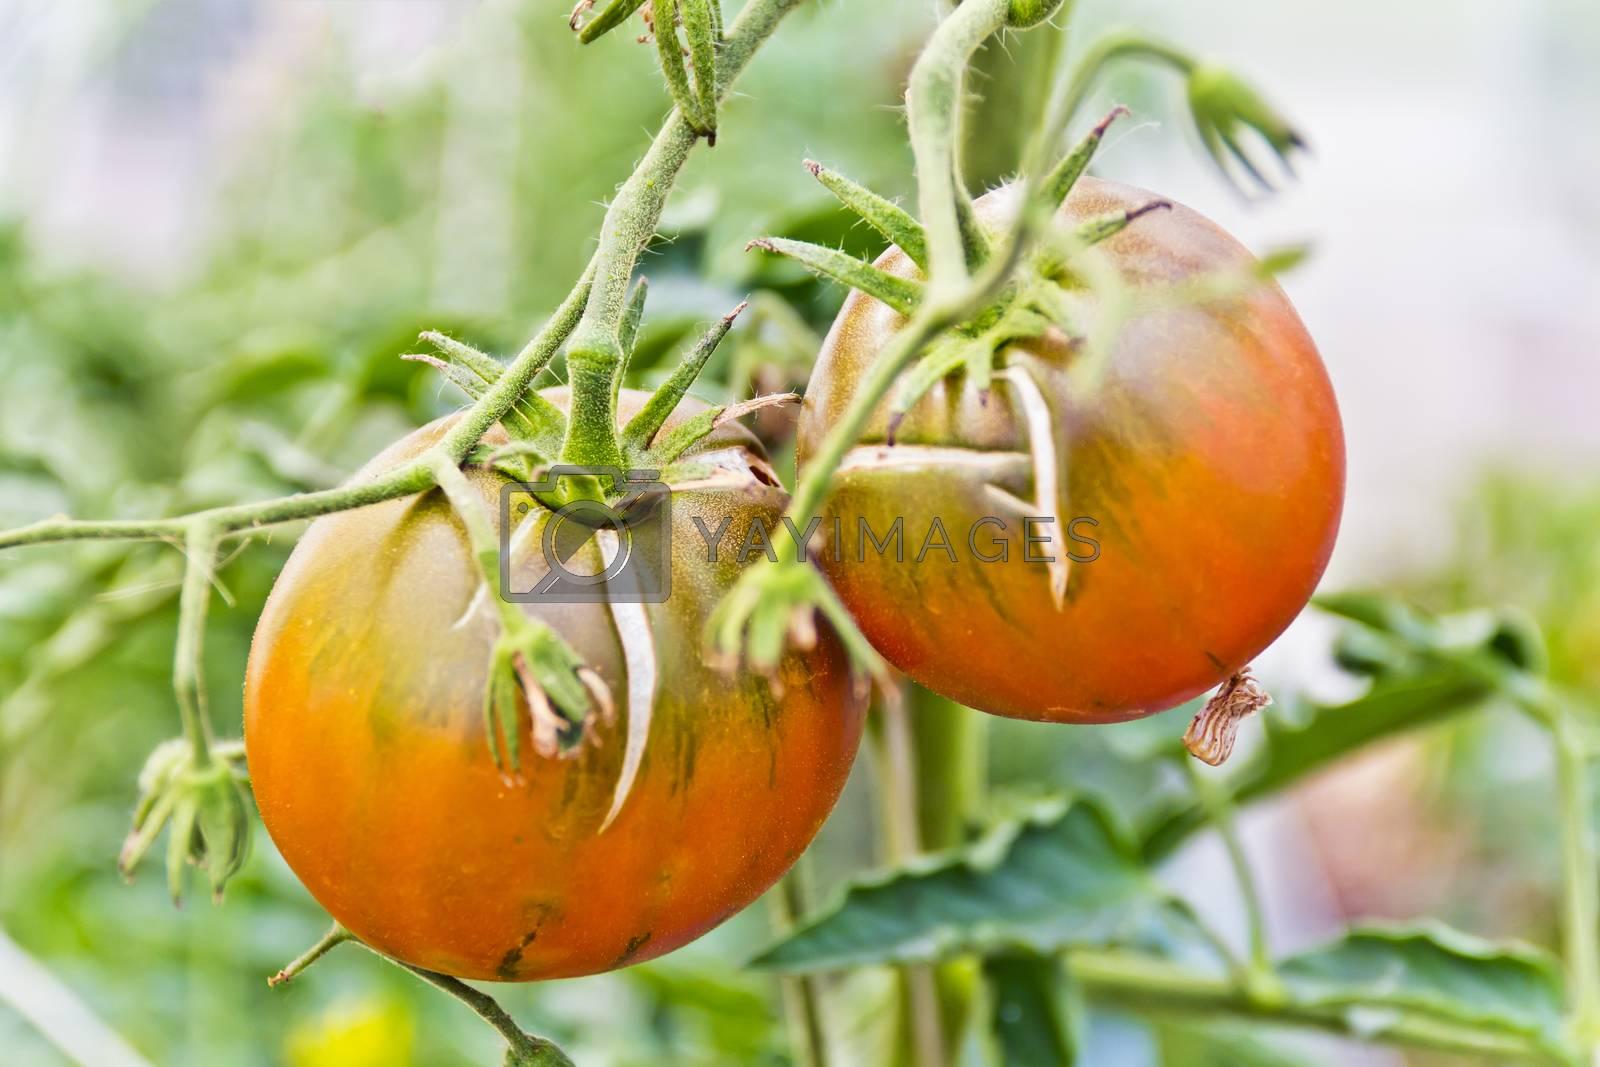 Photo of fresh green tomatos in the garden